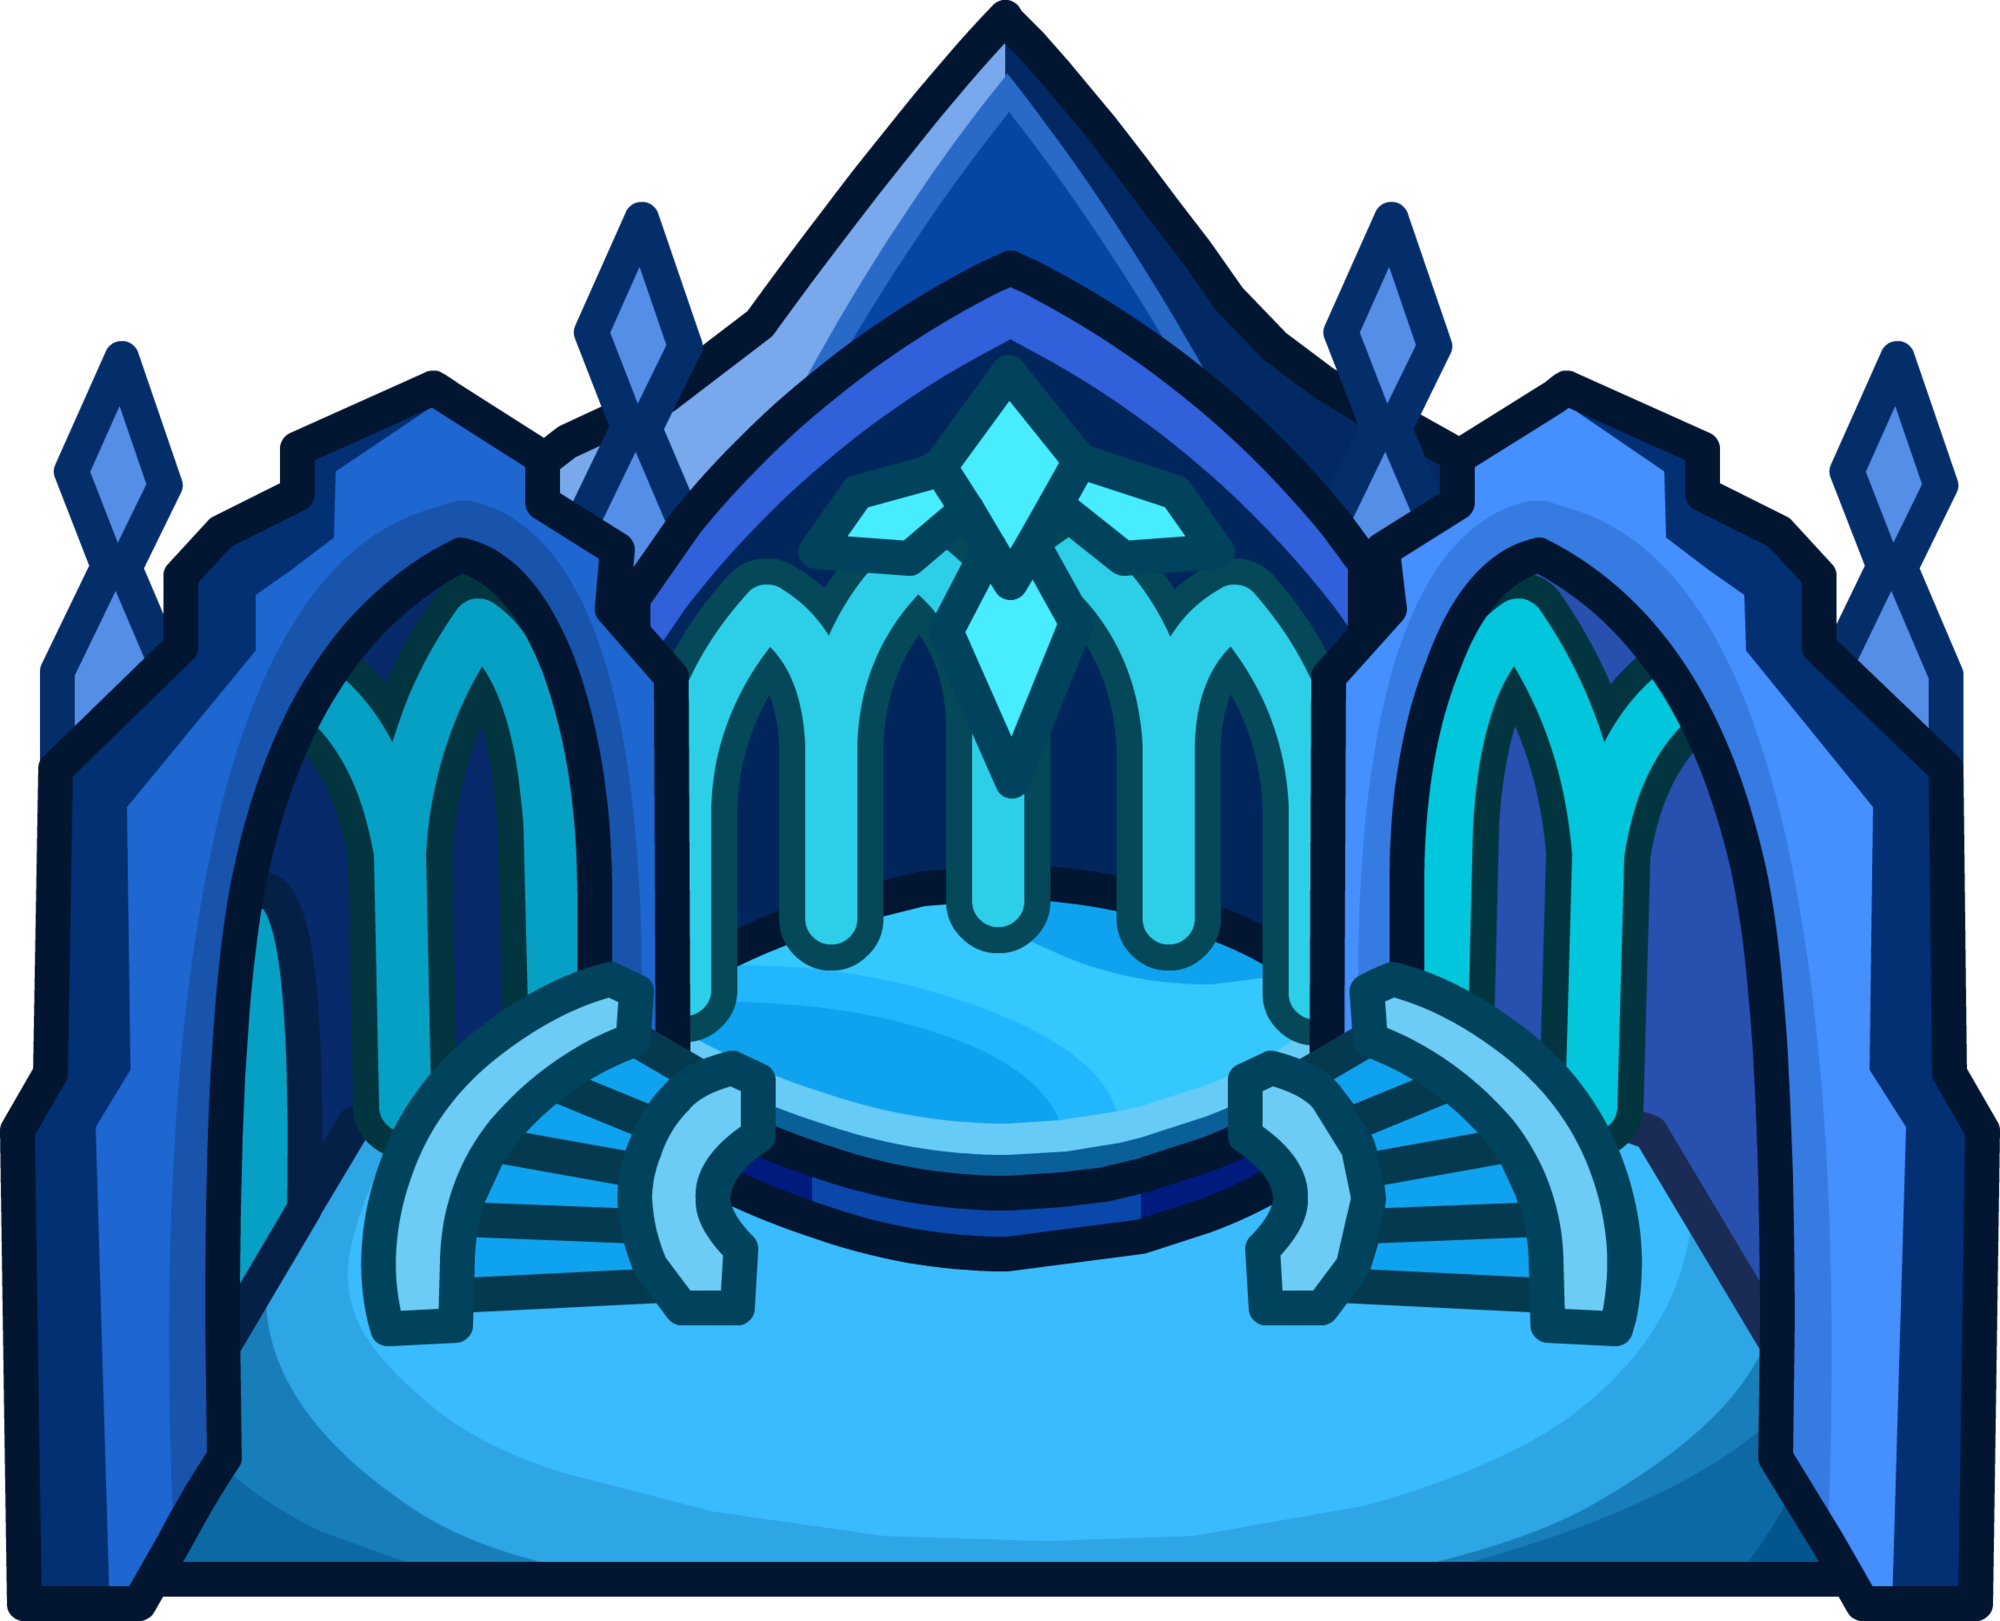 Palace clipart castillo. Ice igloo club penguin